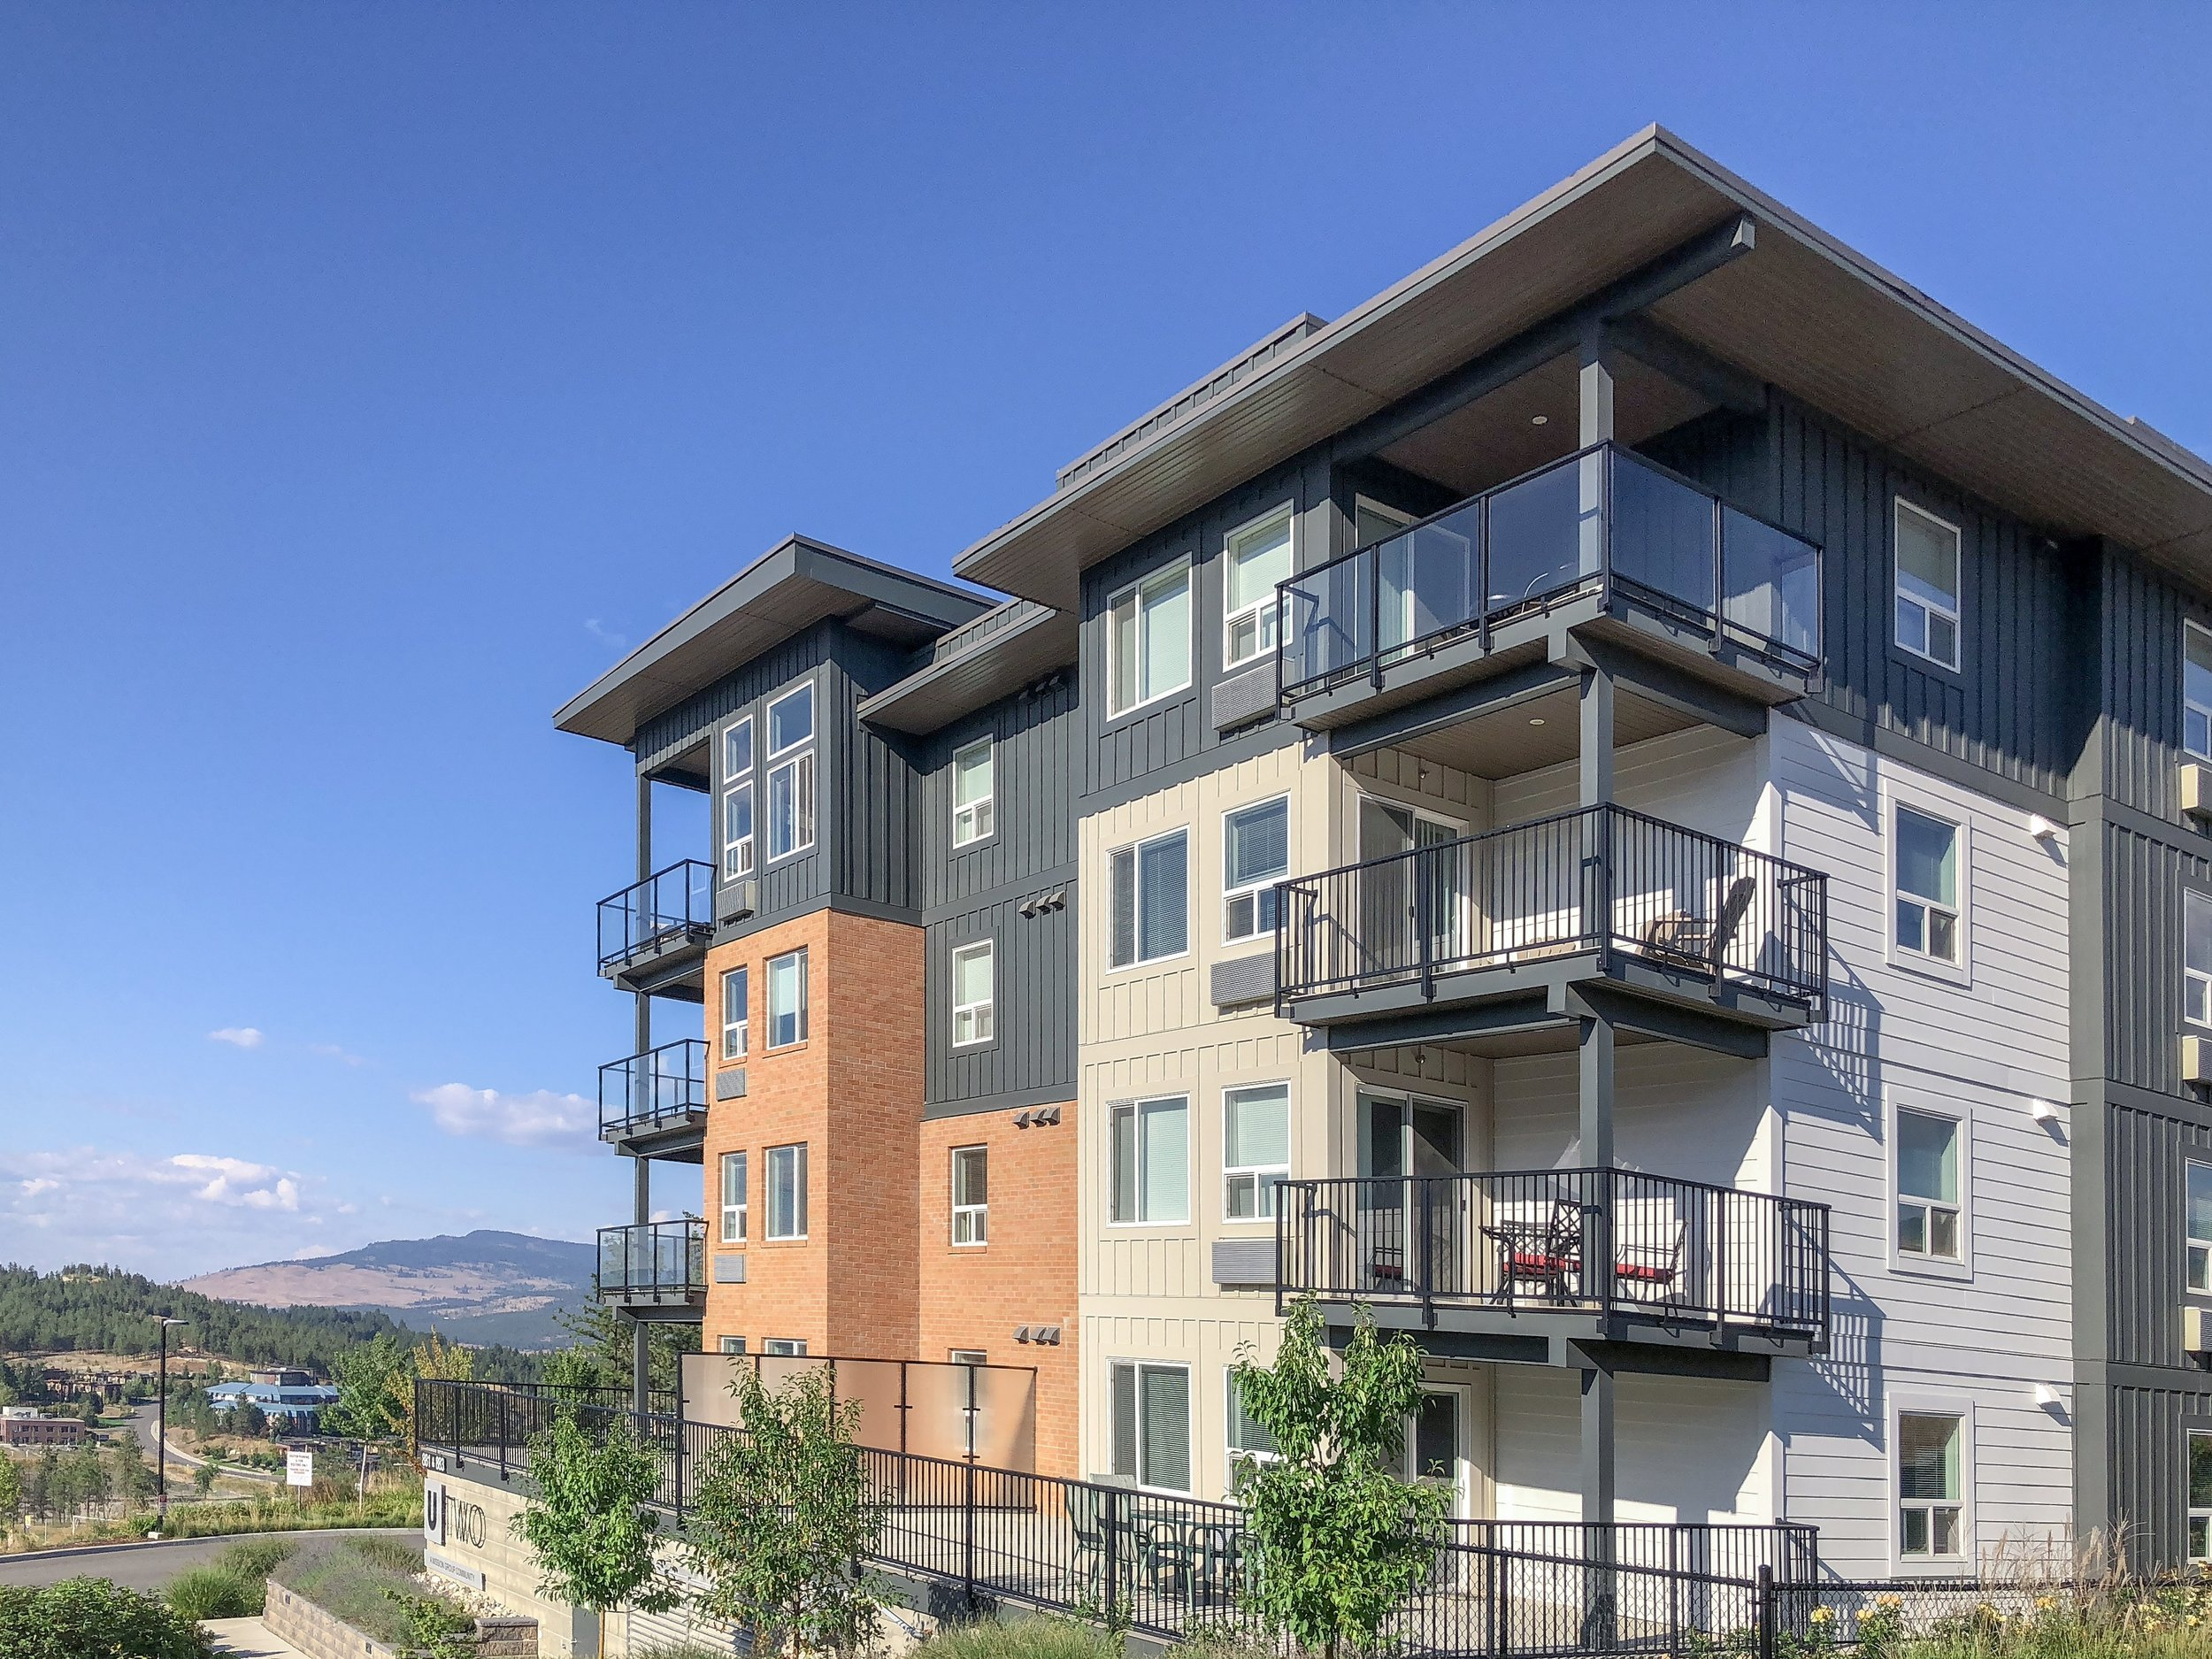 u-two-ubco-02-kelowna-investment-property.jpg